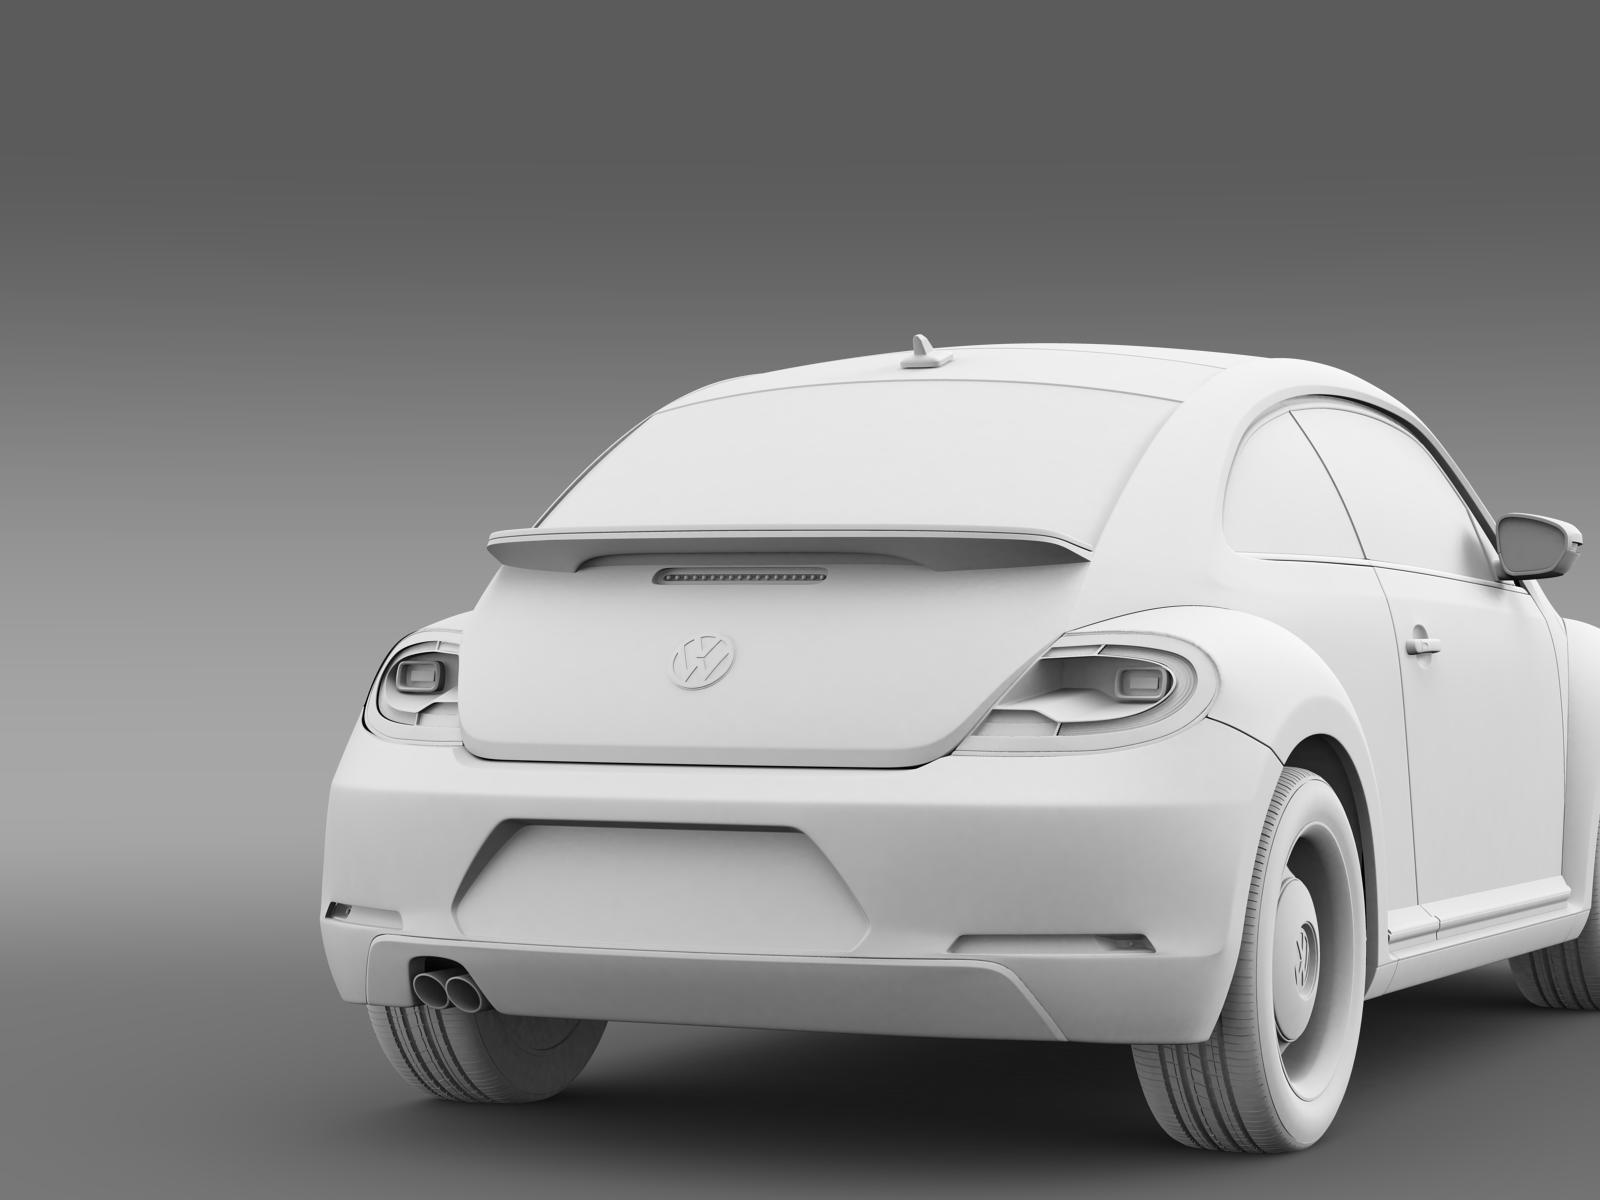 volkswagen beetle classic 2015 3d model. Black Bedroom Furniture Sets. Home Design Ideas